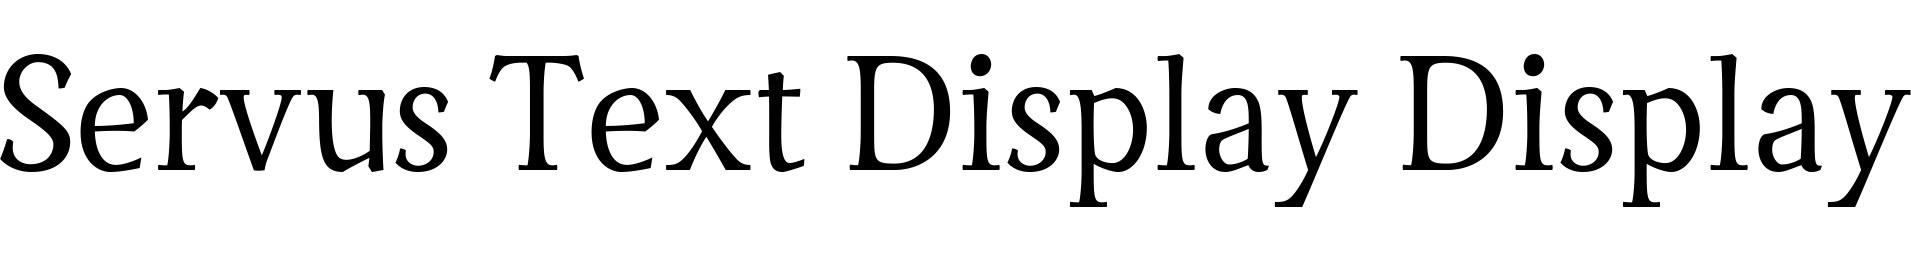 Servus Text Display Display